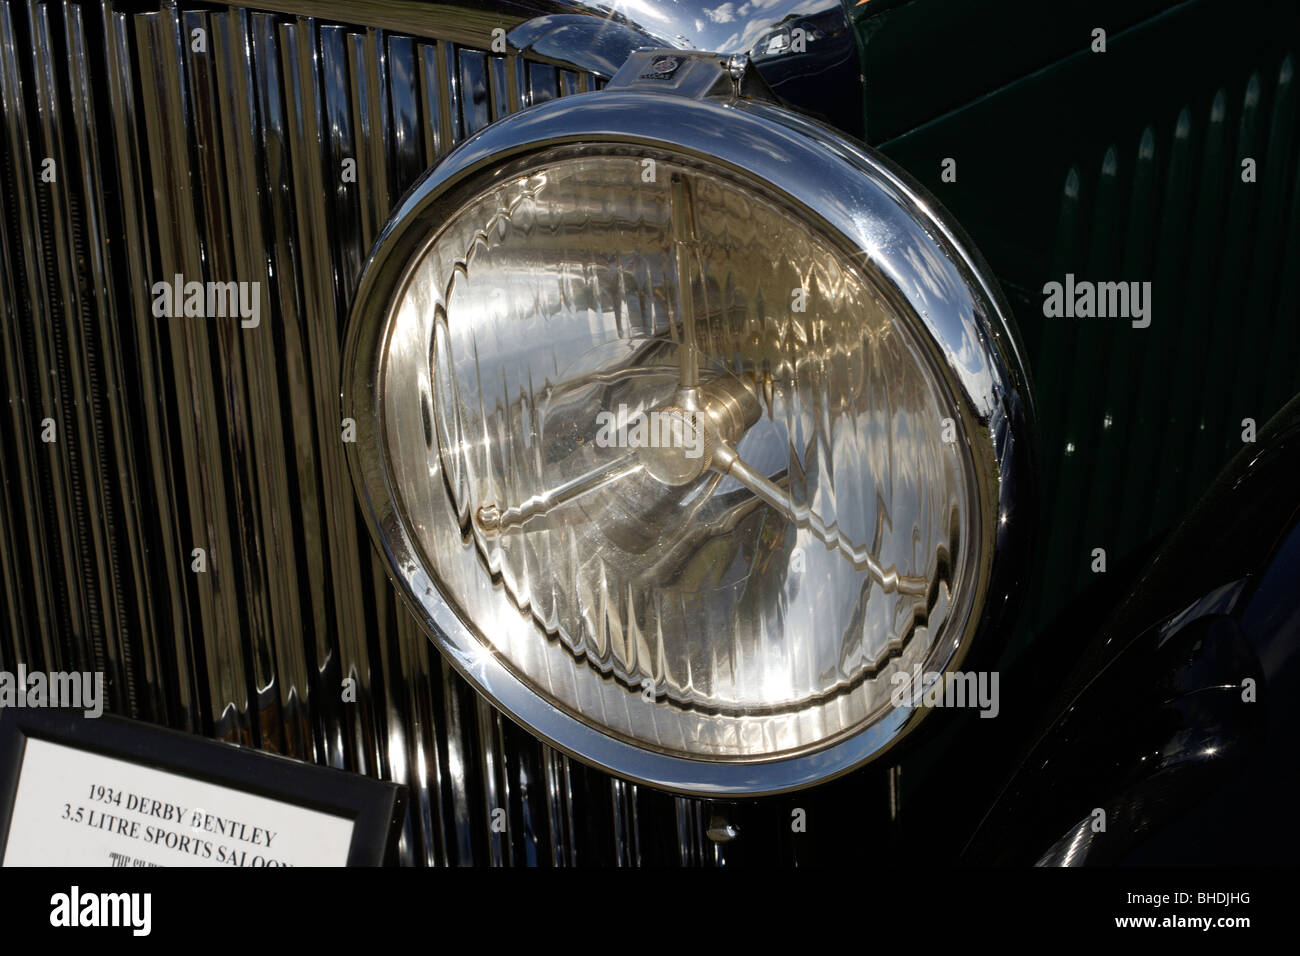 Old car headlight - Stock Image